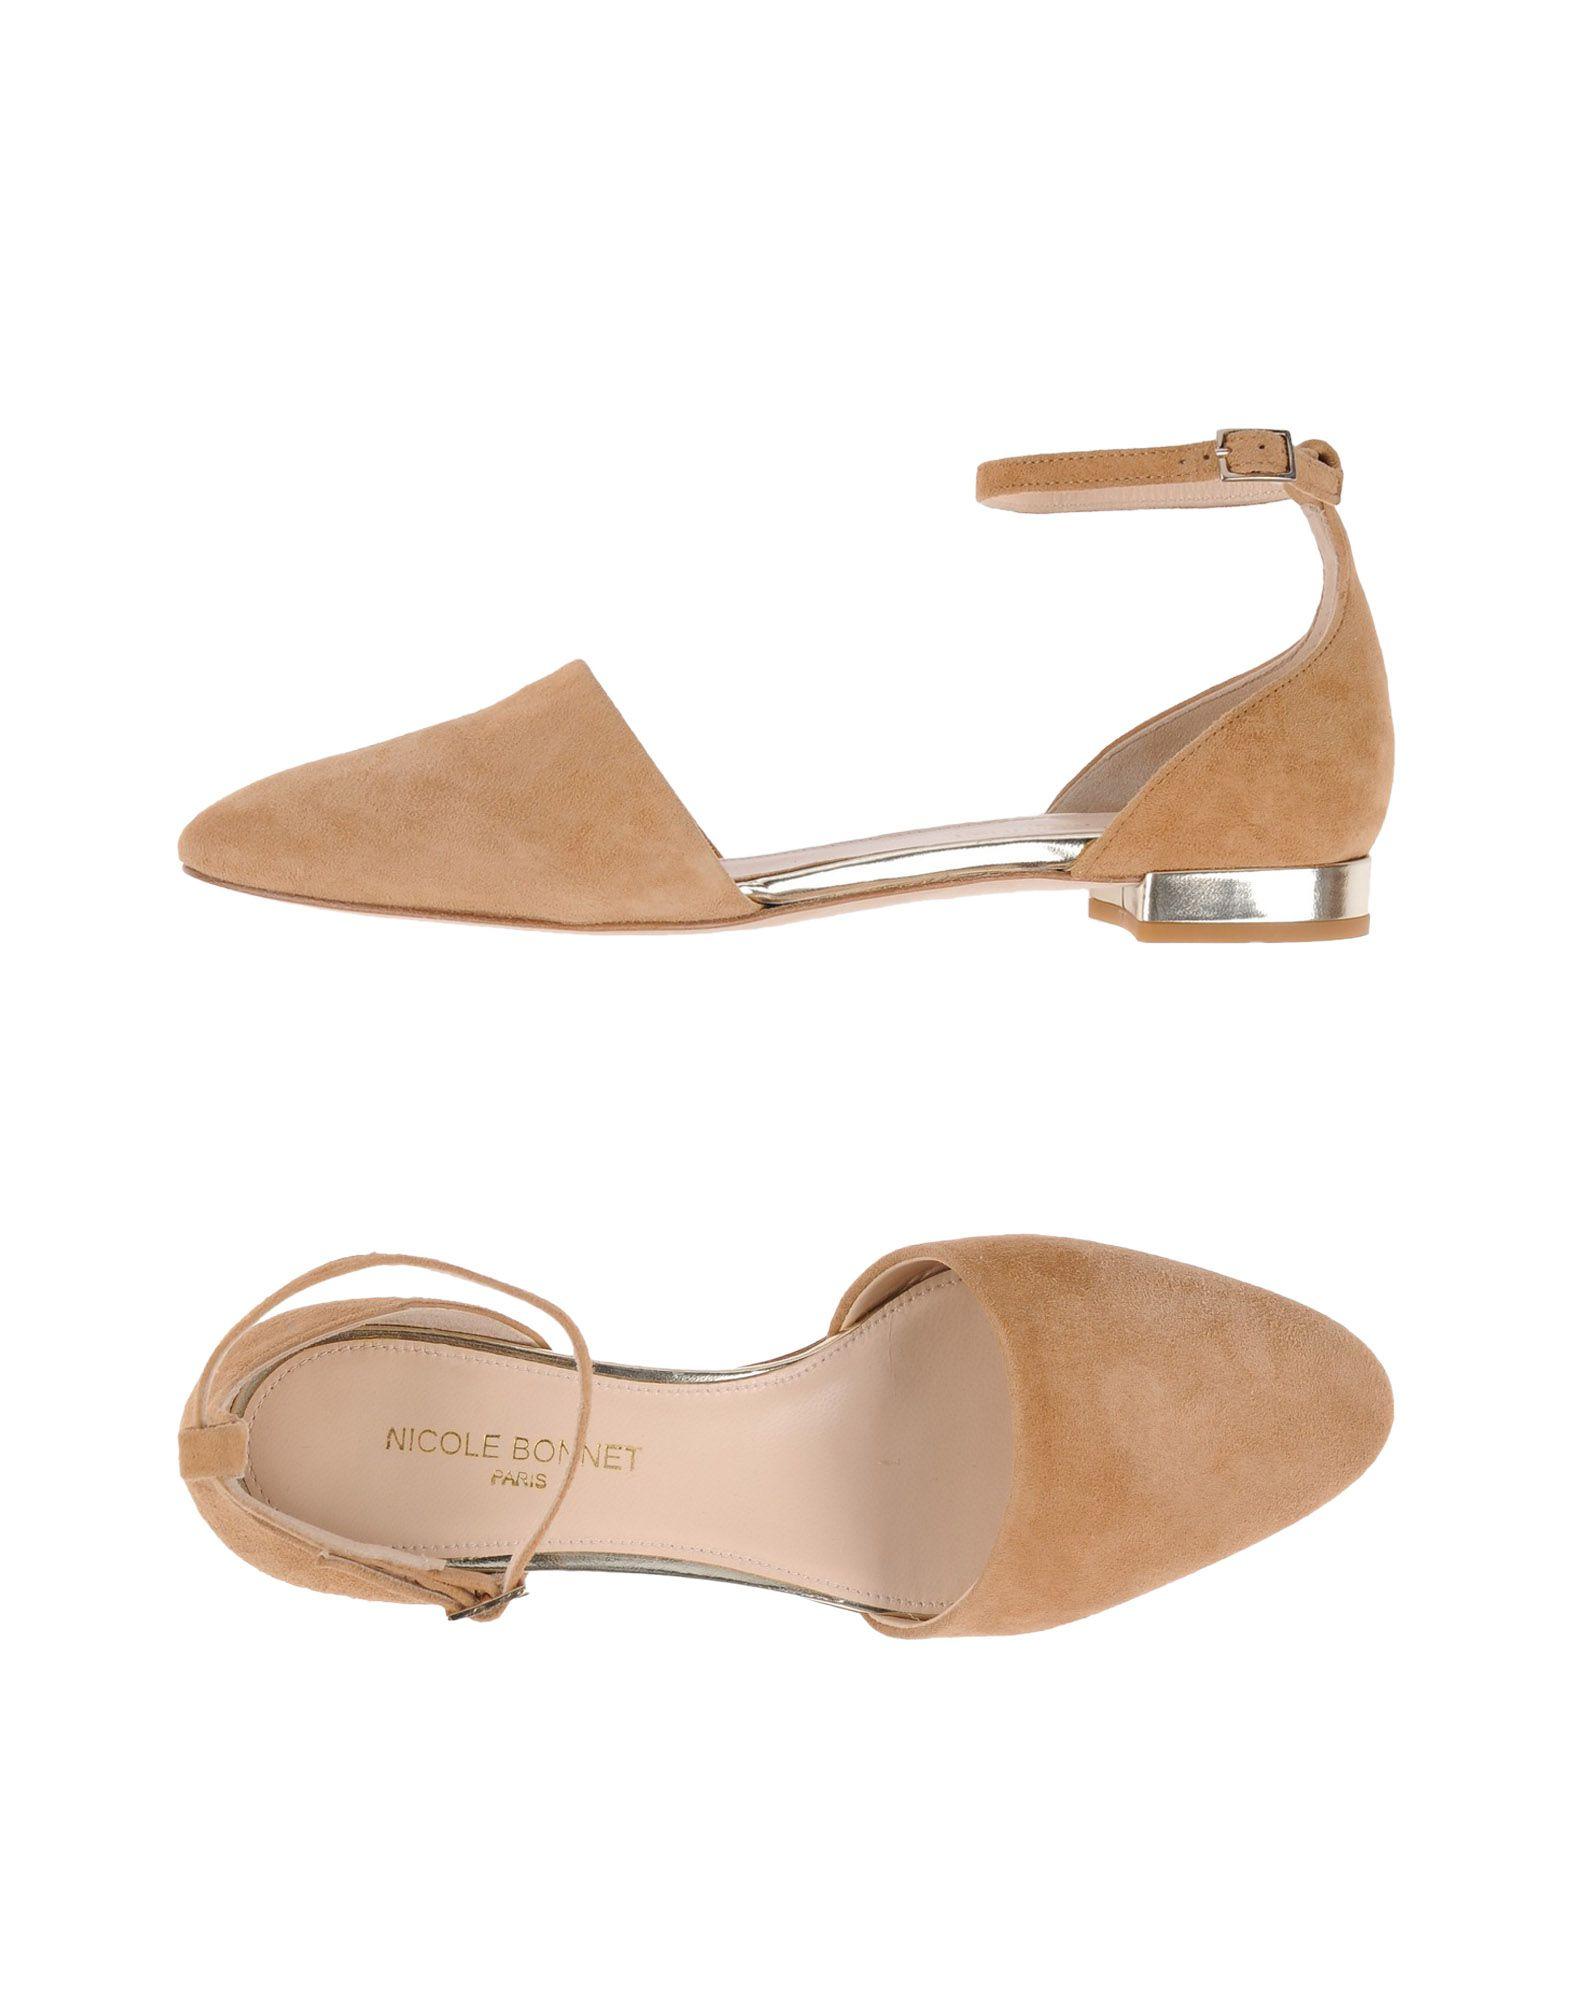 Nicole Bonnet Paris Ballerinas Damen  11435979PG Gute Qualität beliebte Schuhe